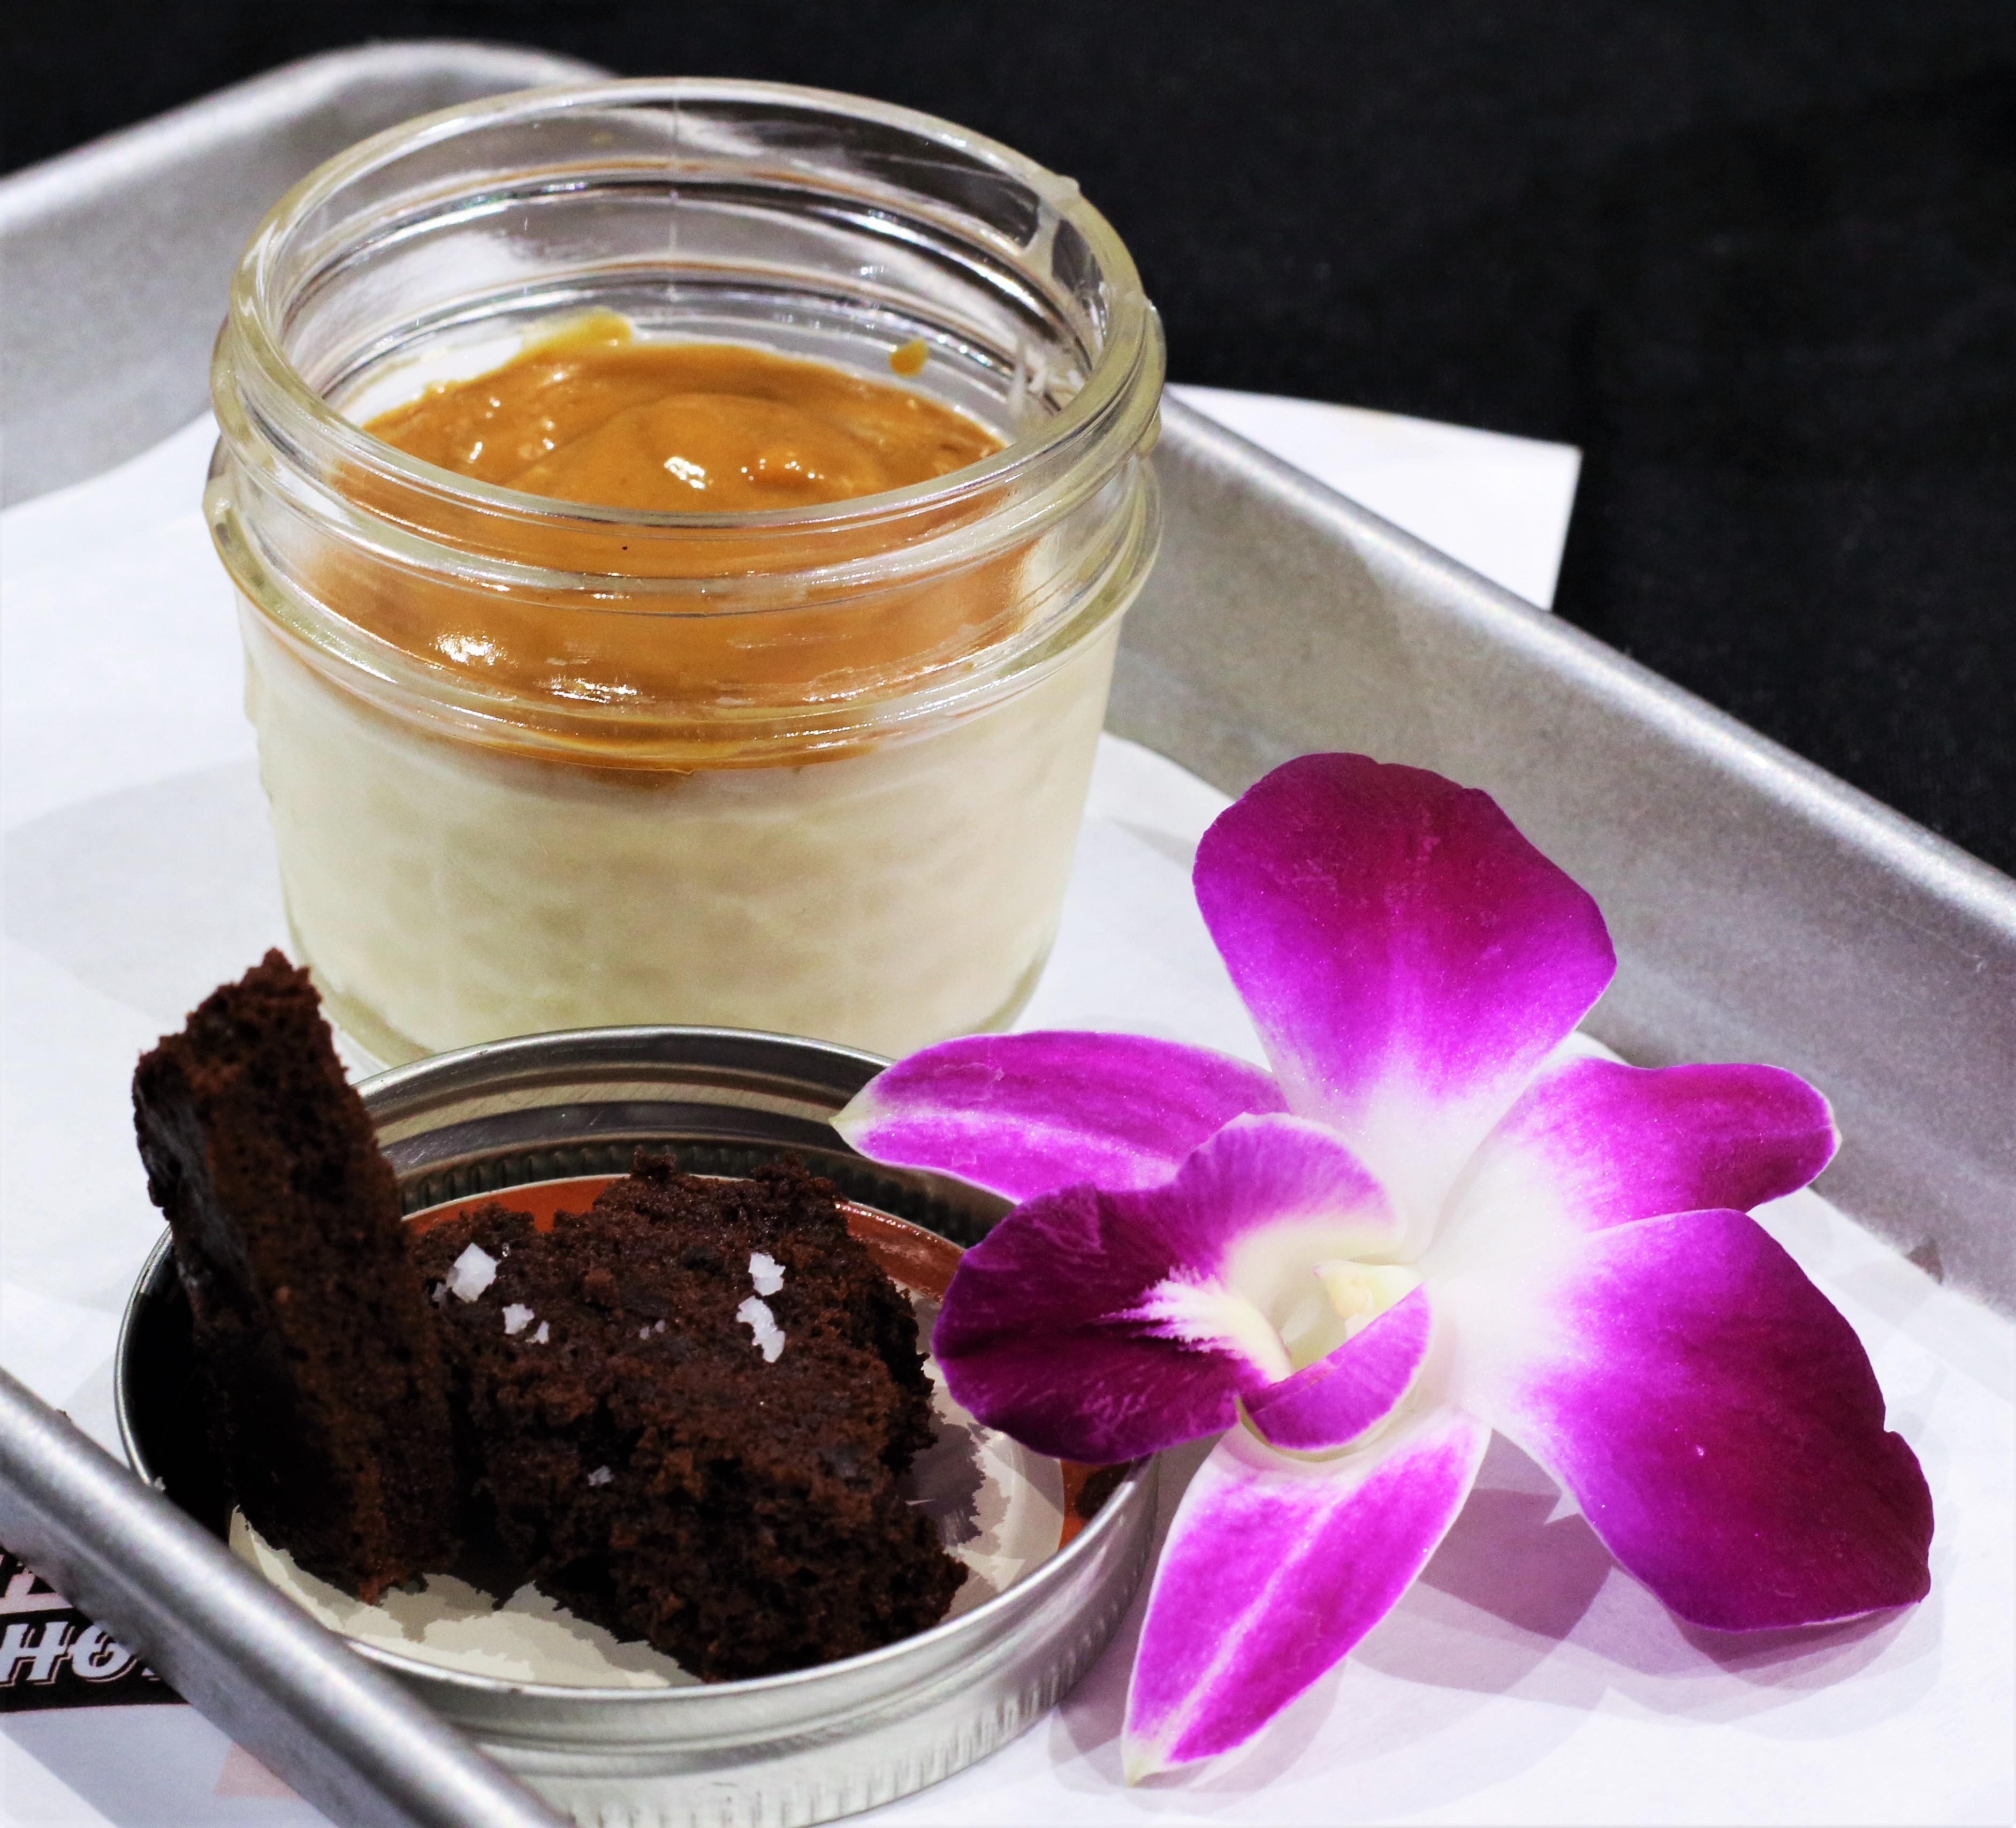 Guanabana Panna Cotta, lucuma manjar blanco, chocolate sponge cake, foodie, farm shed dinner, pacha chefs, tres dallas, dallas farmers market